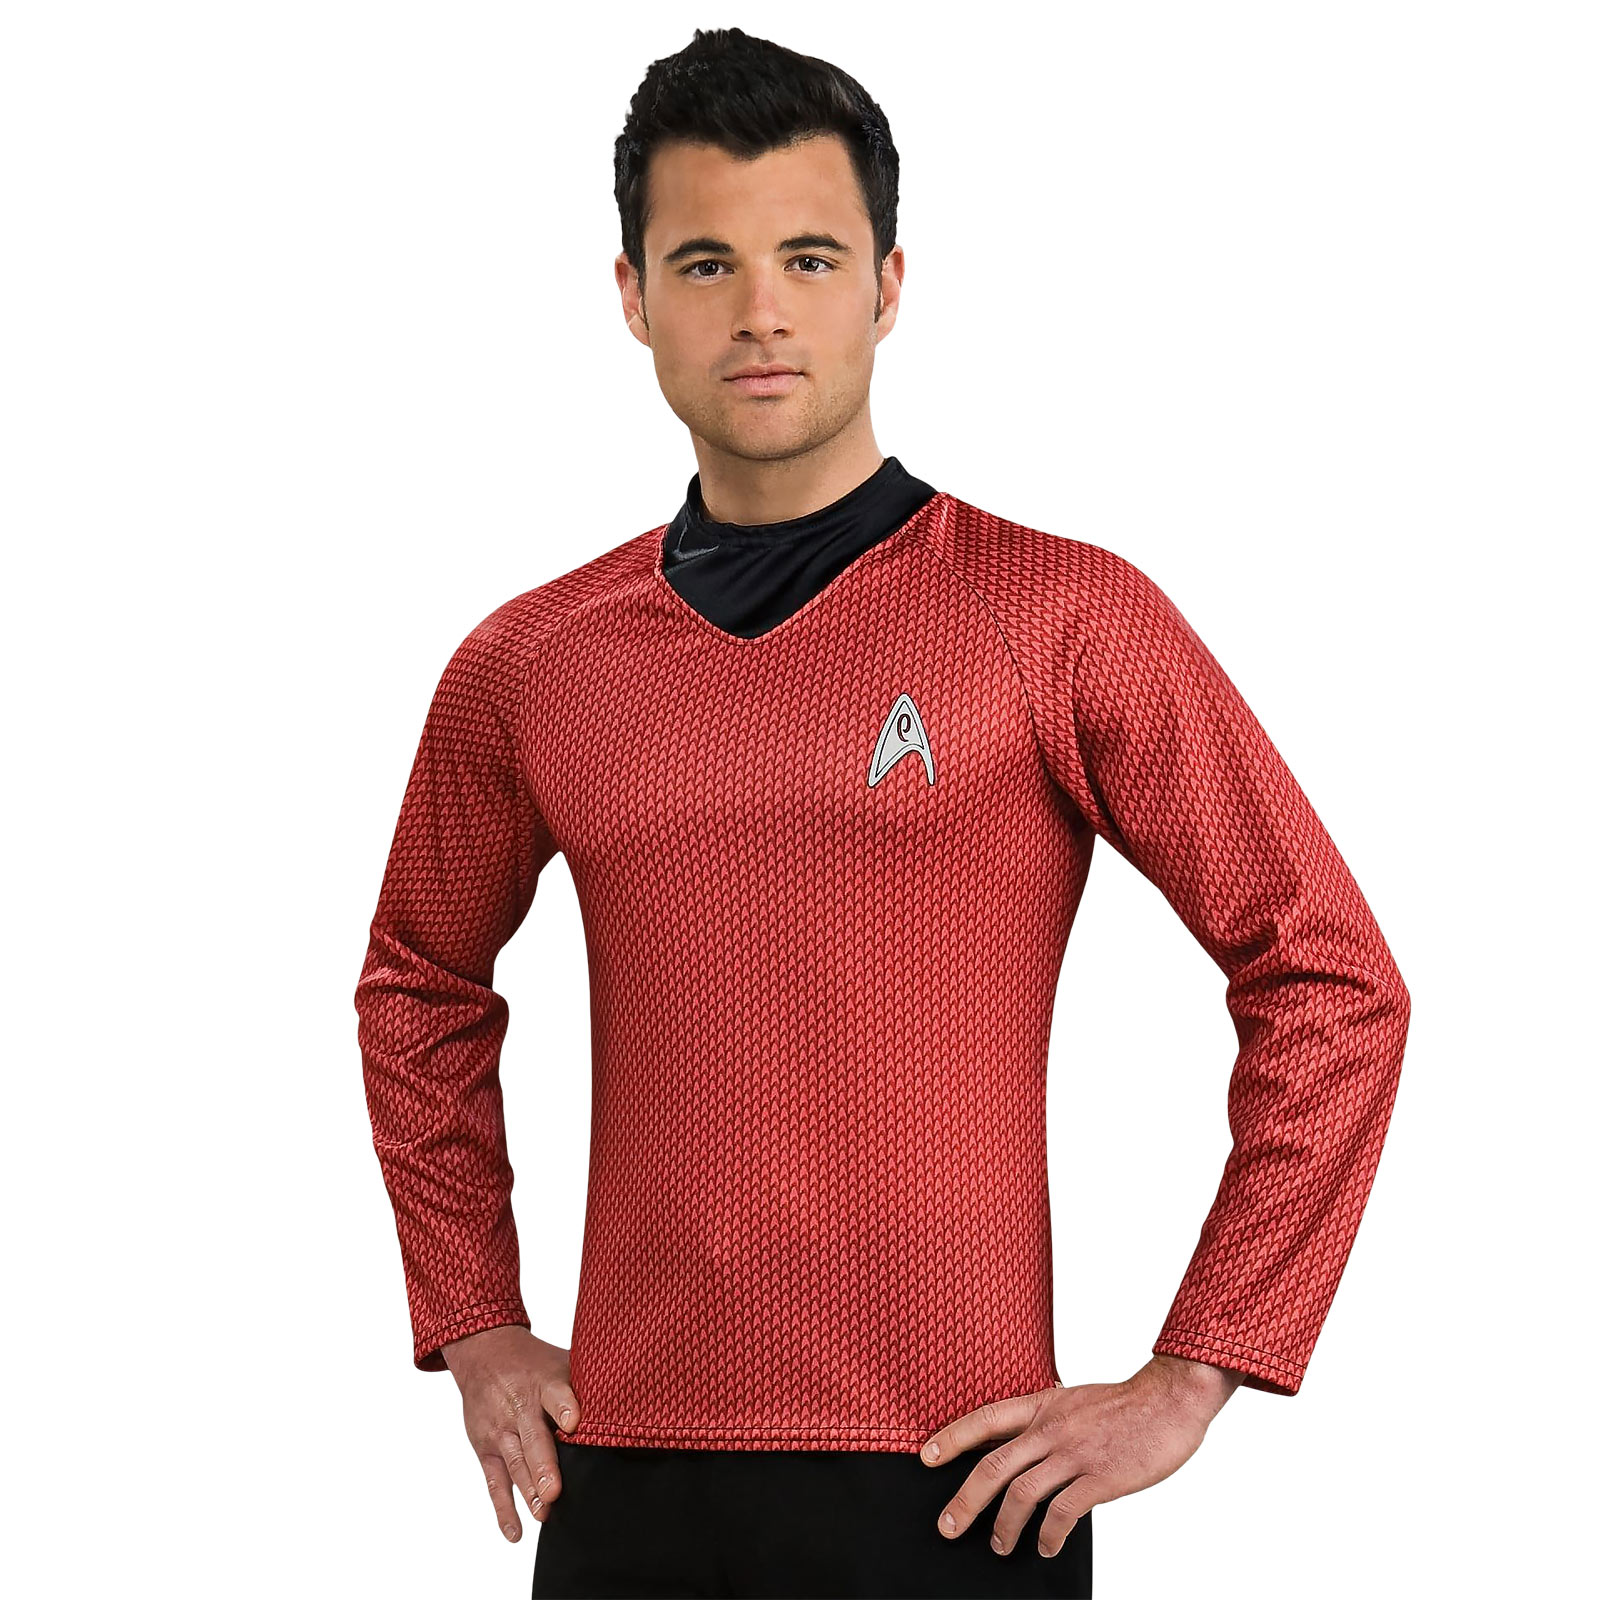 Star Trek - Scotty Movie Kostüm Shirt rot